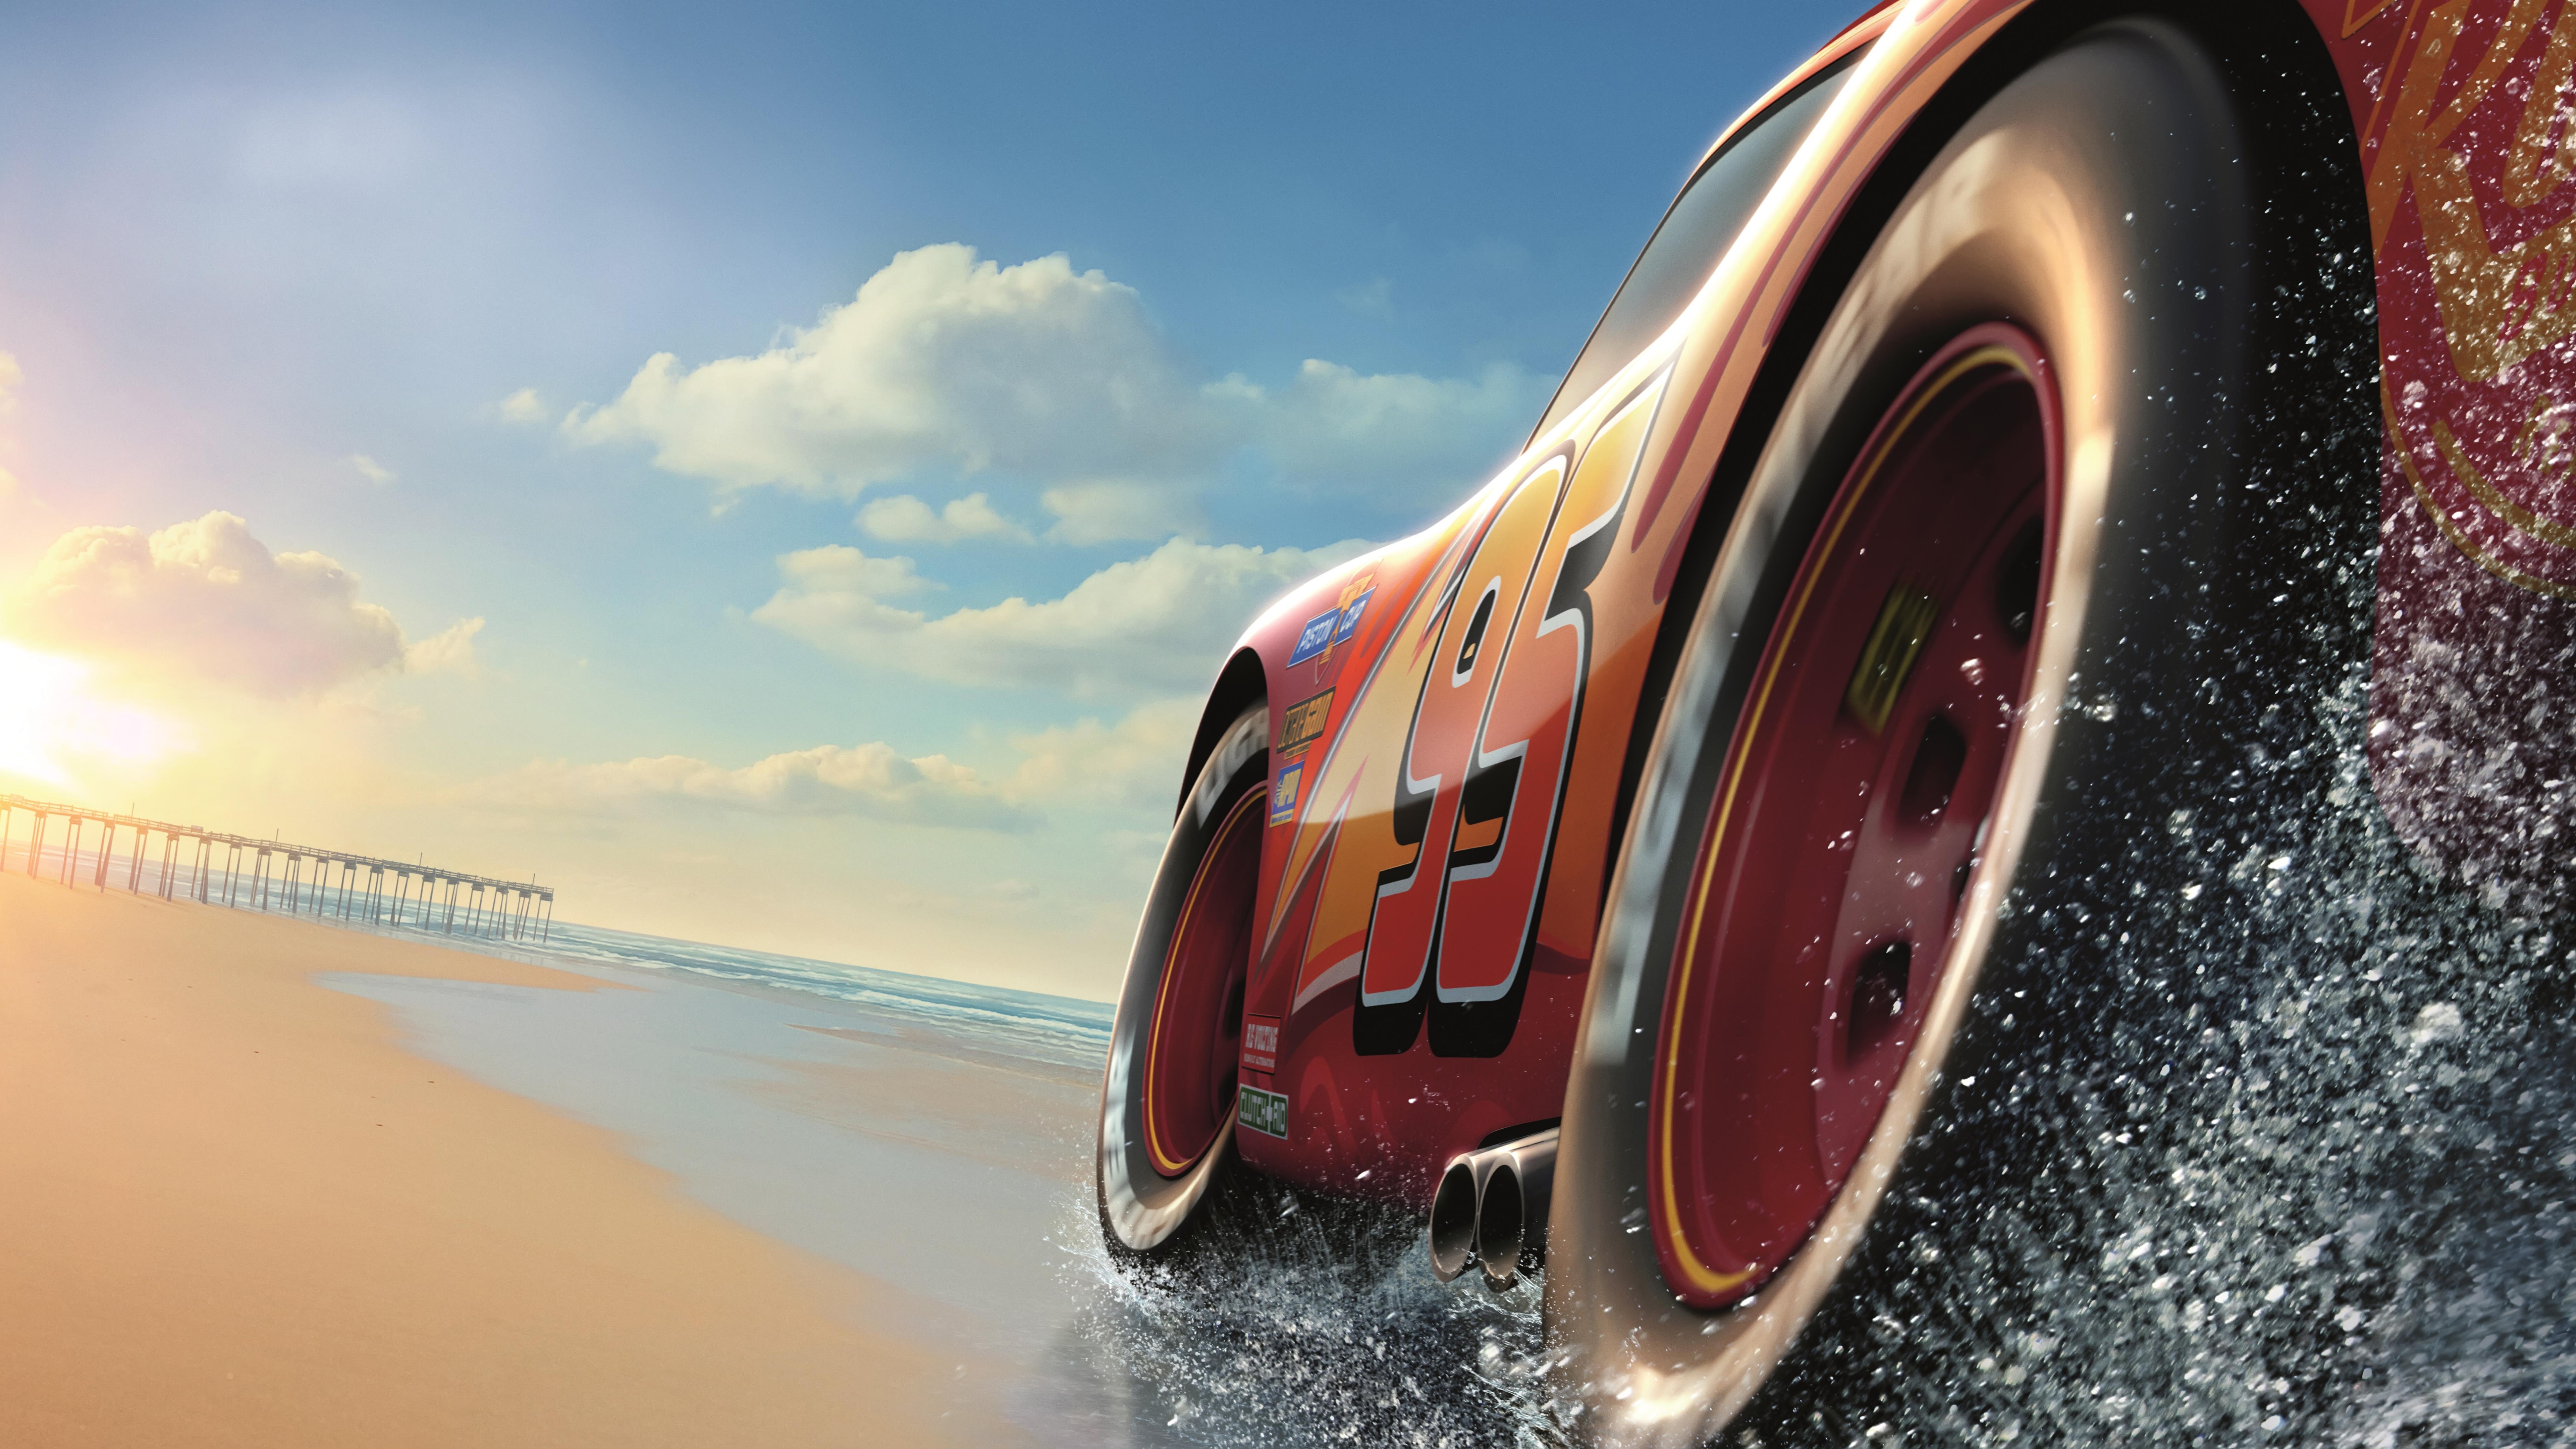 7680x4320 Cars 3 8k Disney Movie 8k HD 4k Wallpapers, Images